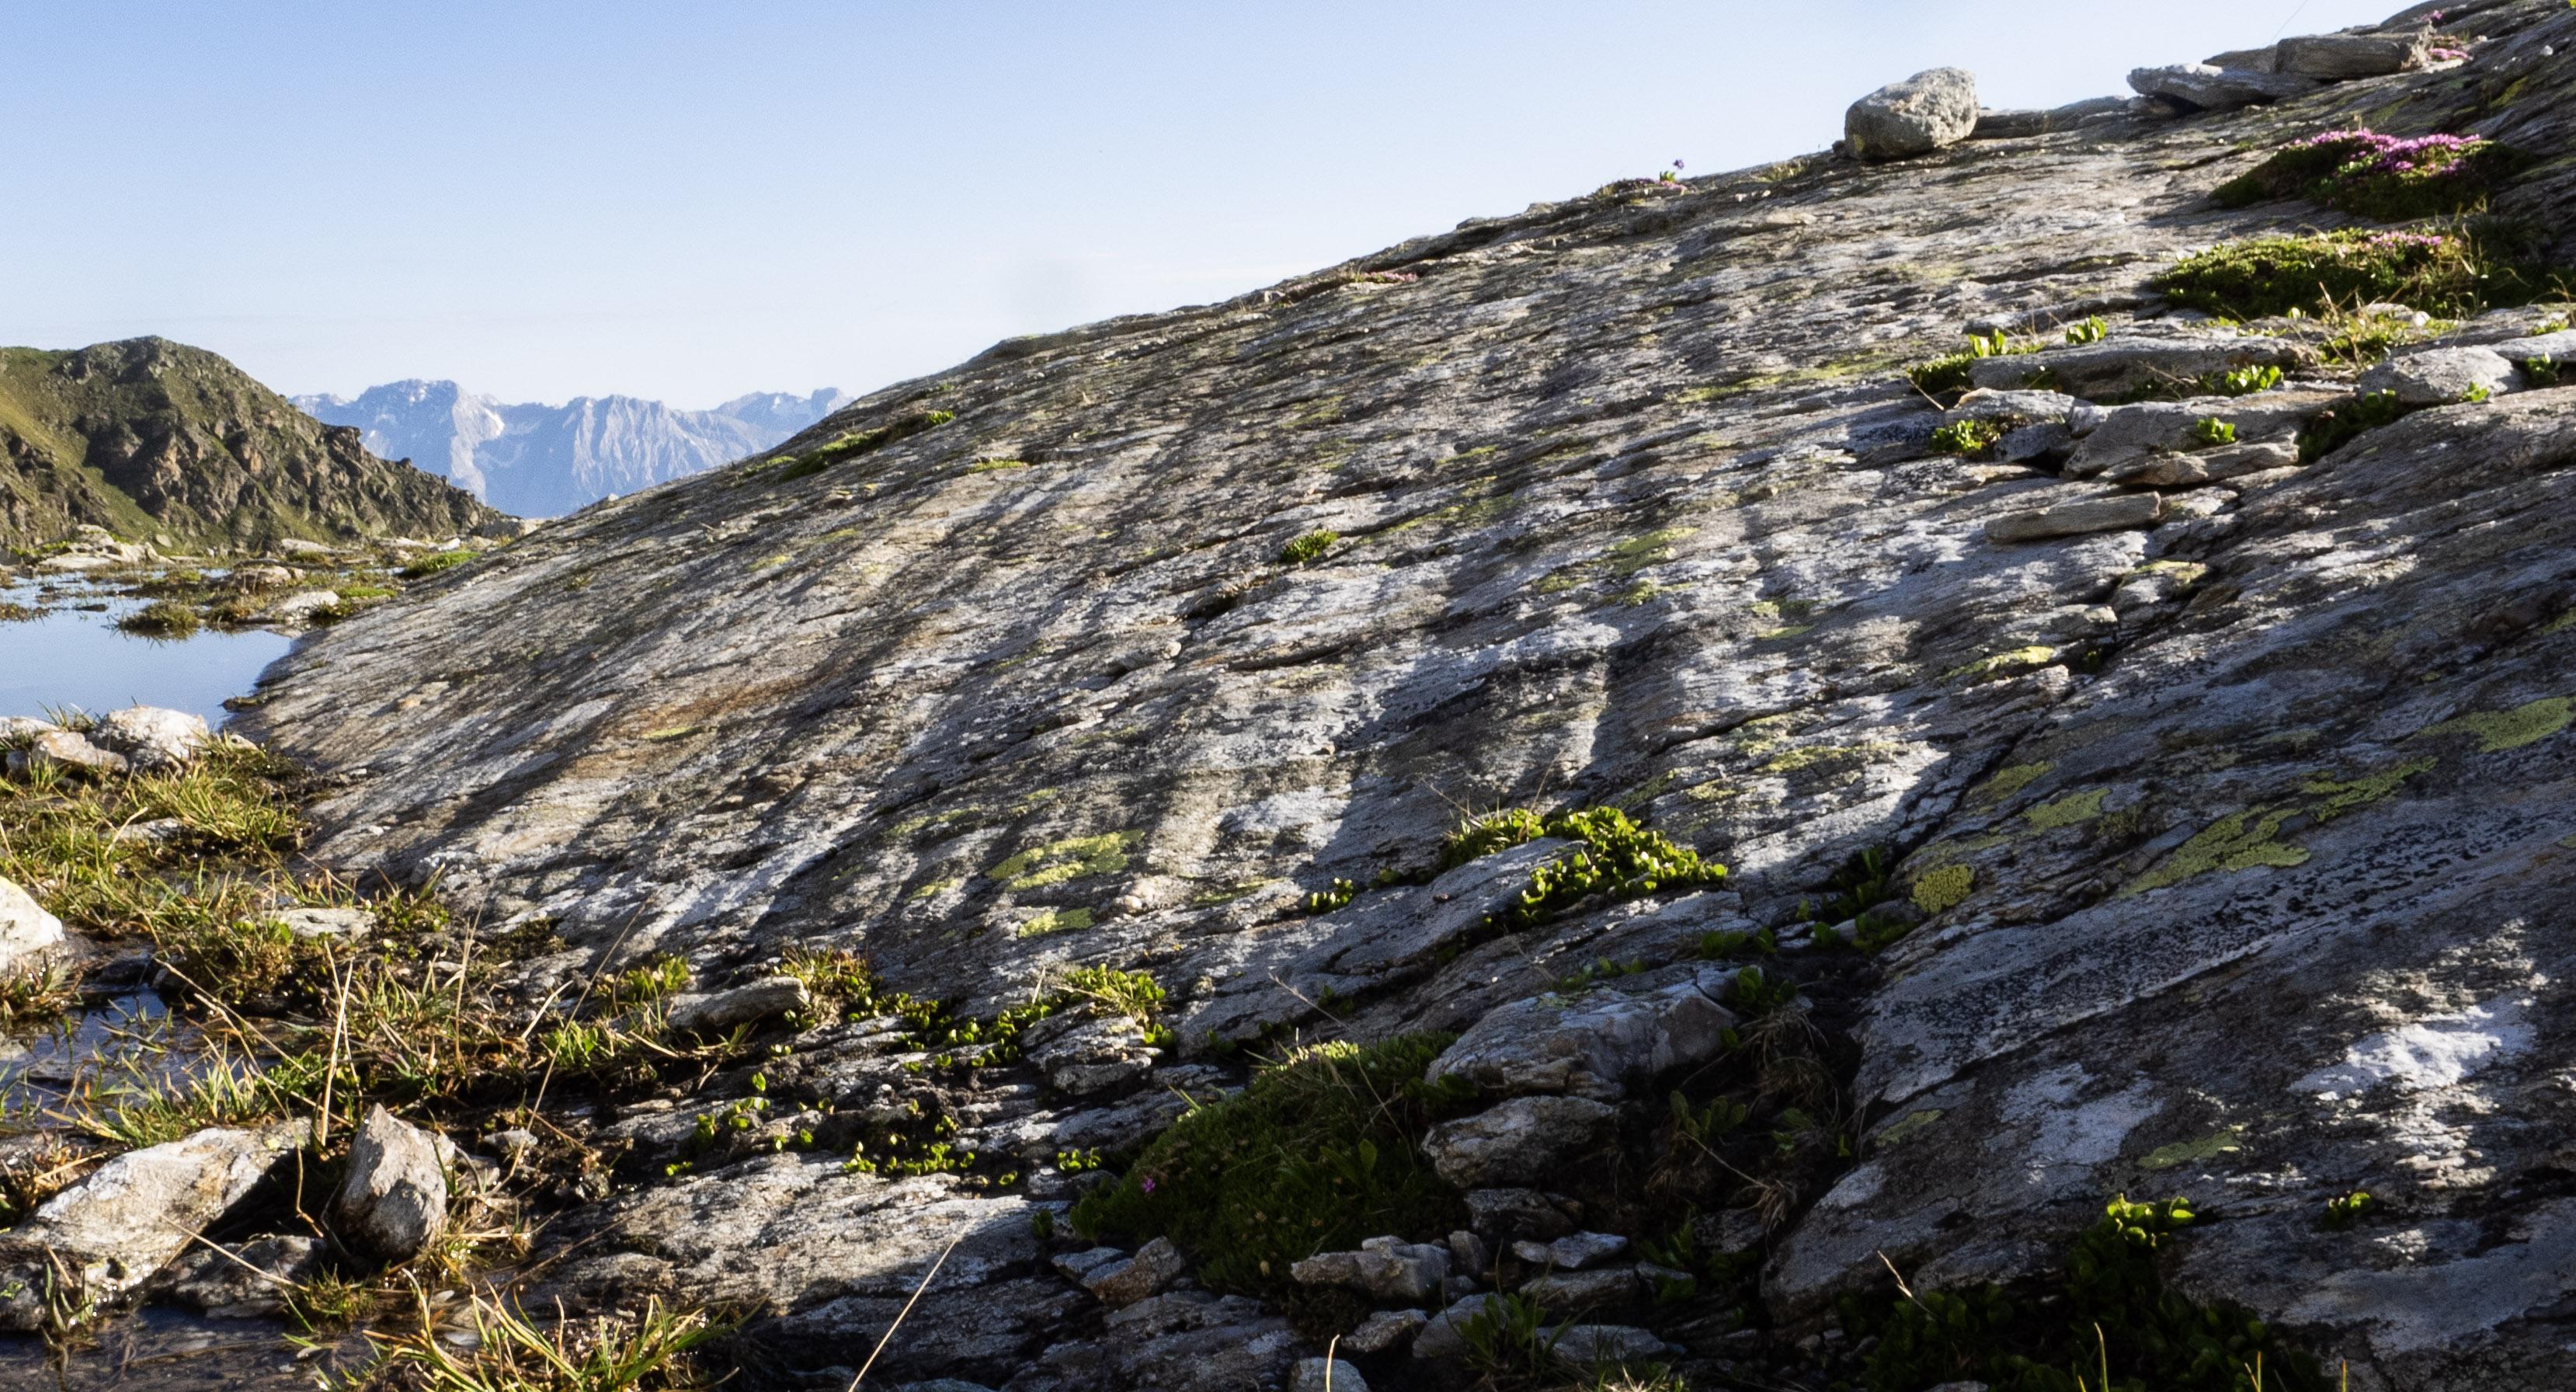 Gletscherschliff im Gamskar unterm Rosenjoch